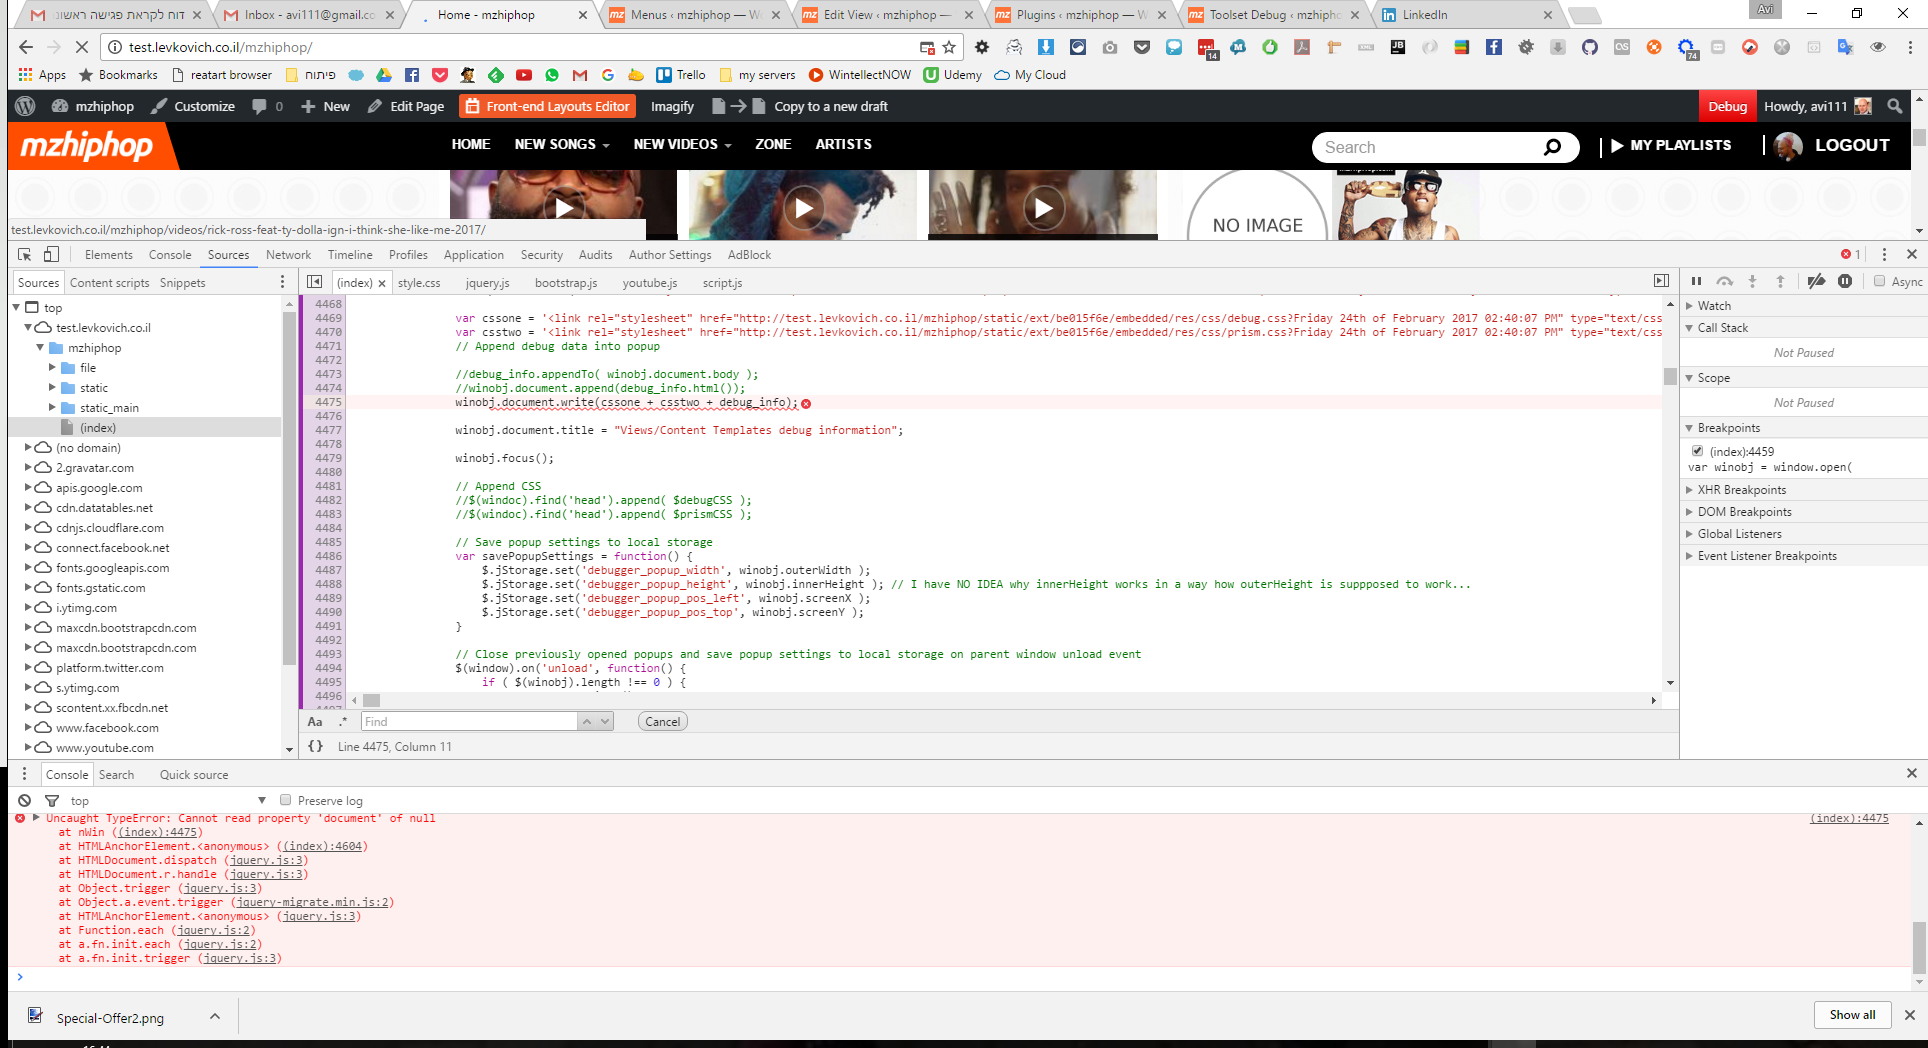 Screenshot 2017-02-24 16.44.51.png